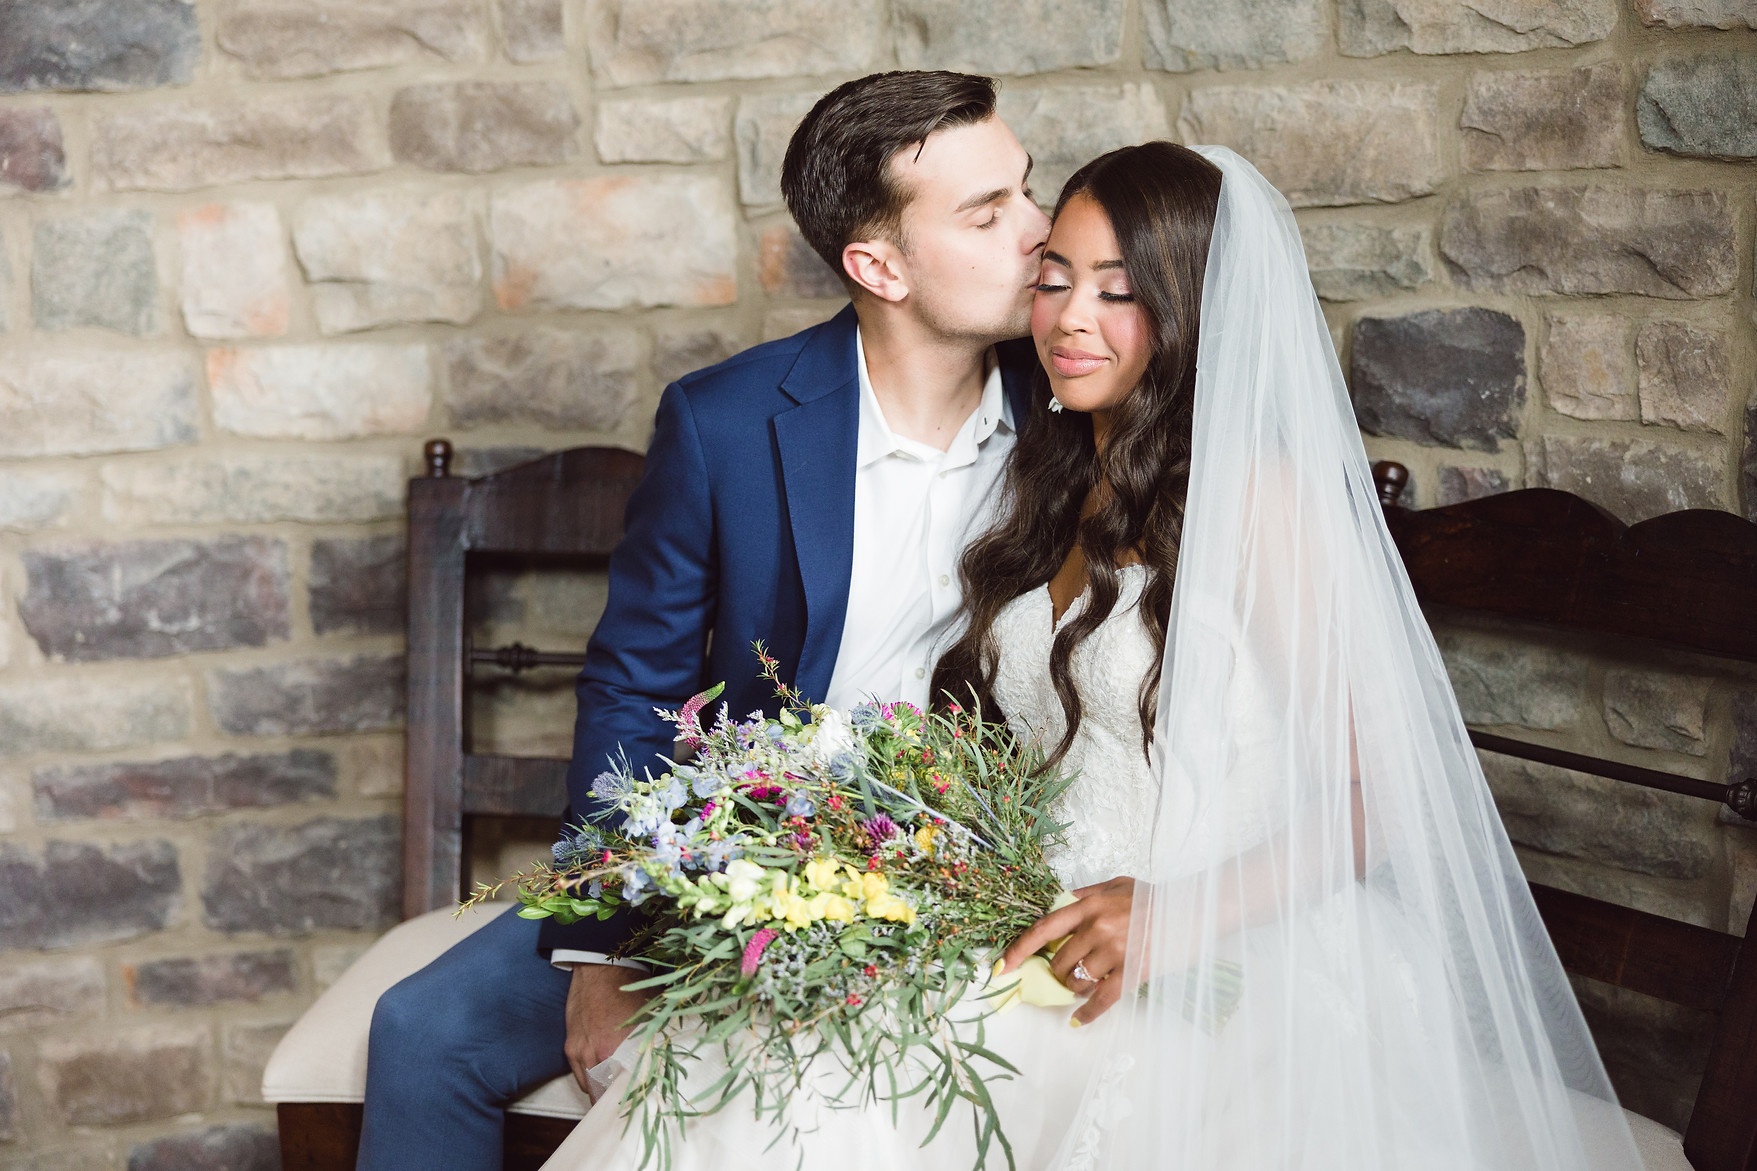 Groom kissing bride's forehead, set against The English Barn stone wall